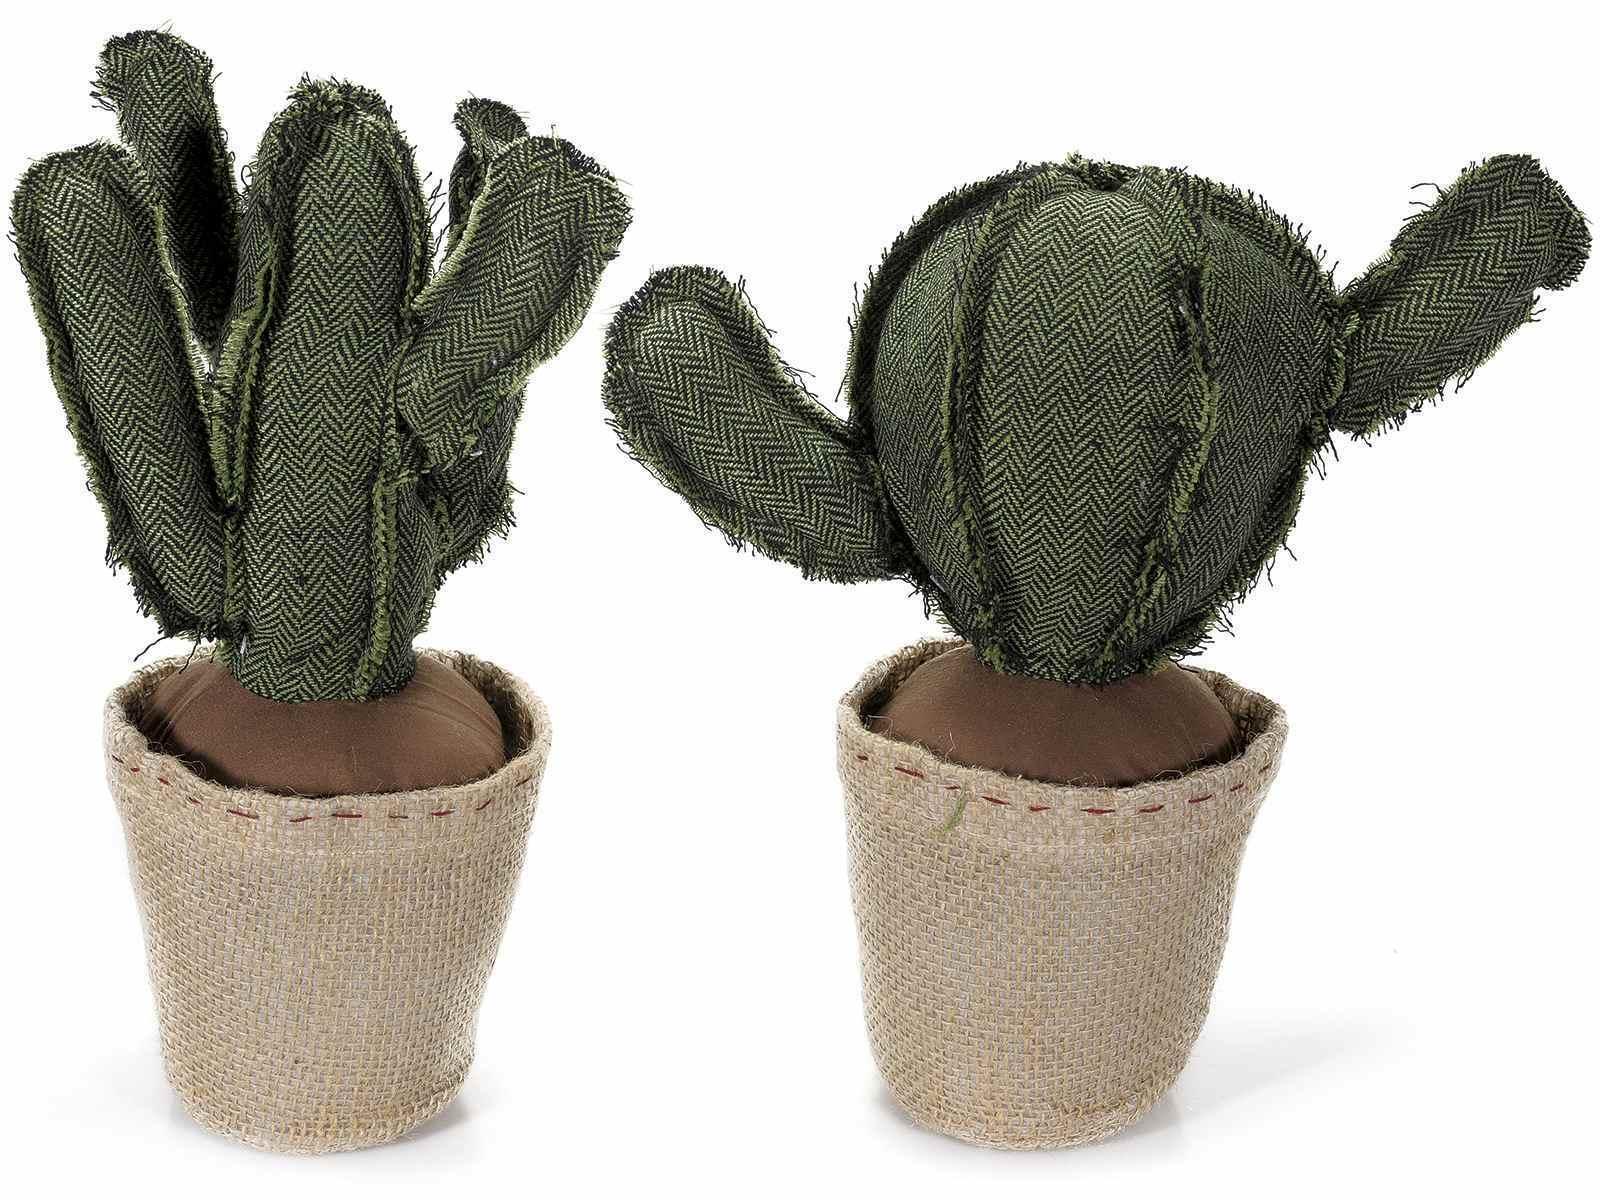 FERMAPORTA CACTUS stoffa imbottita casa arroto shabby pianta grassa h35 messican